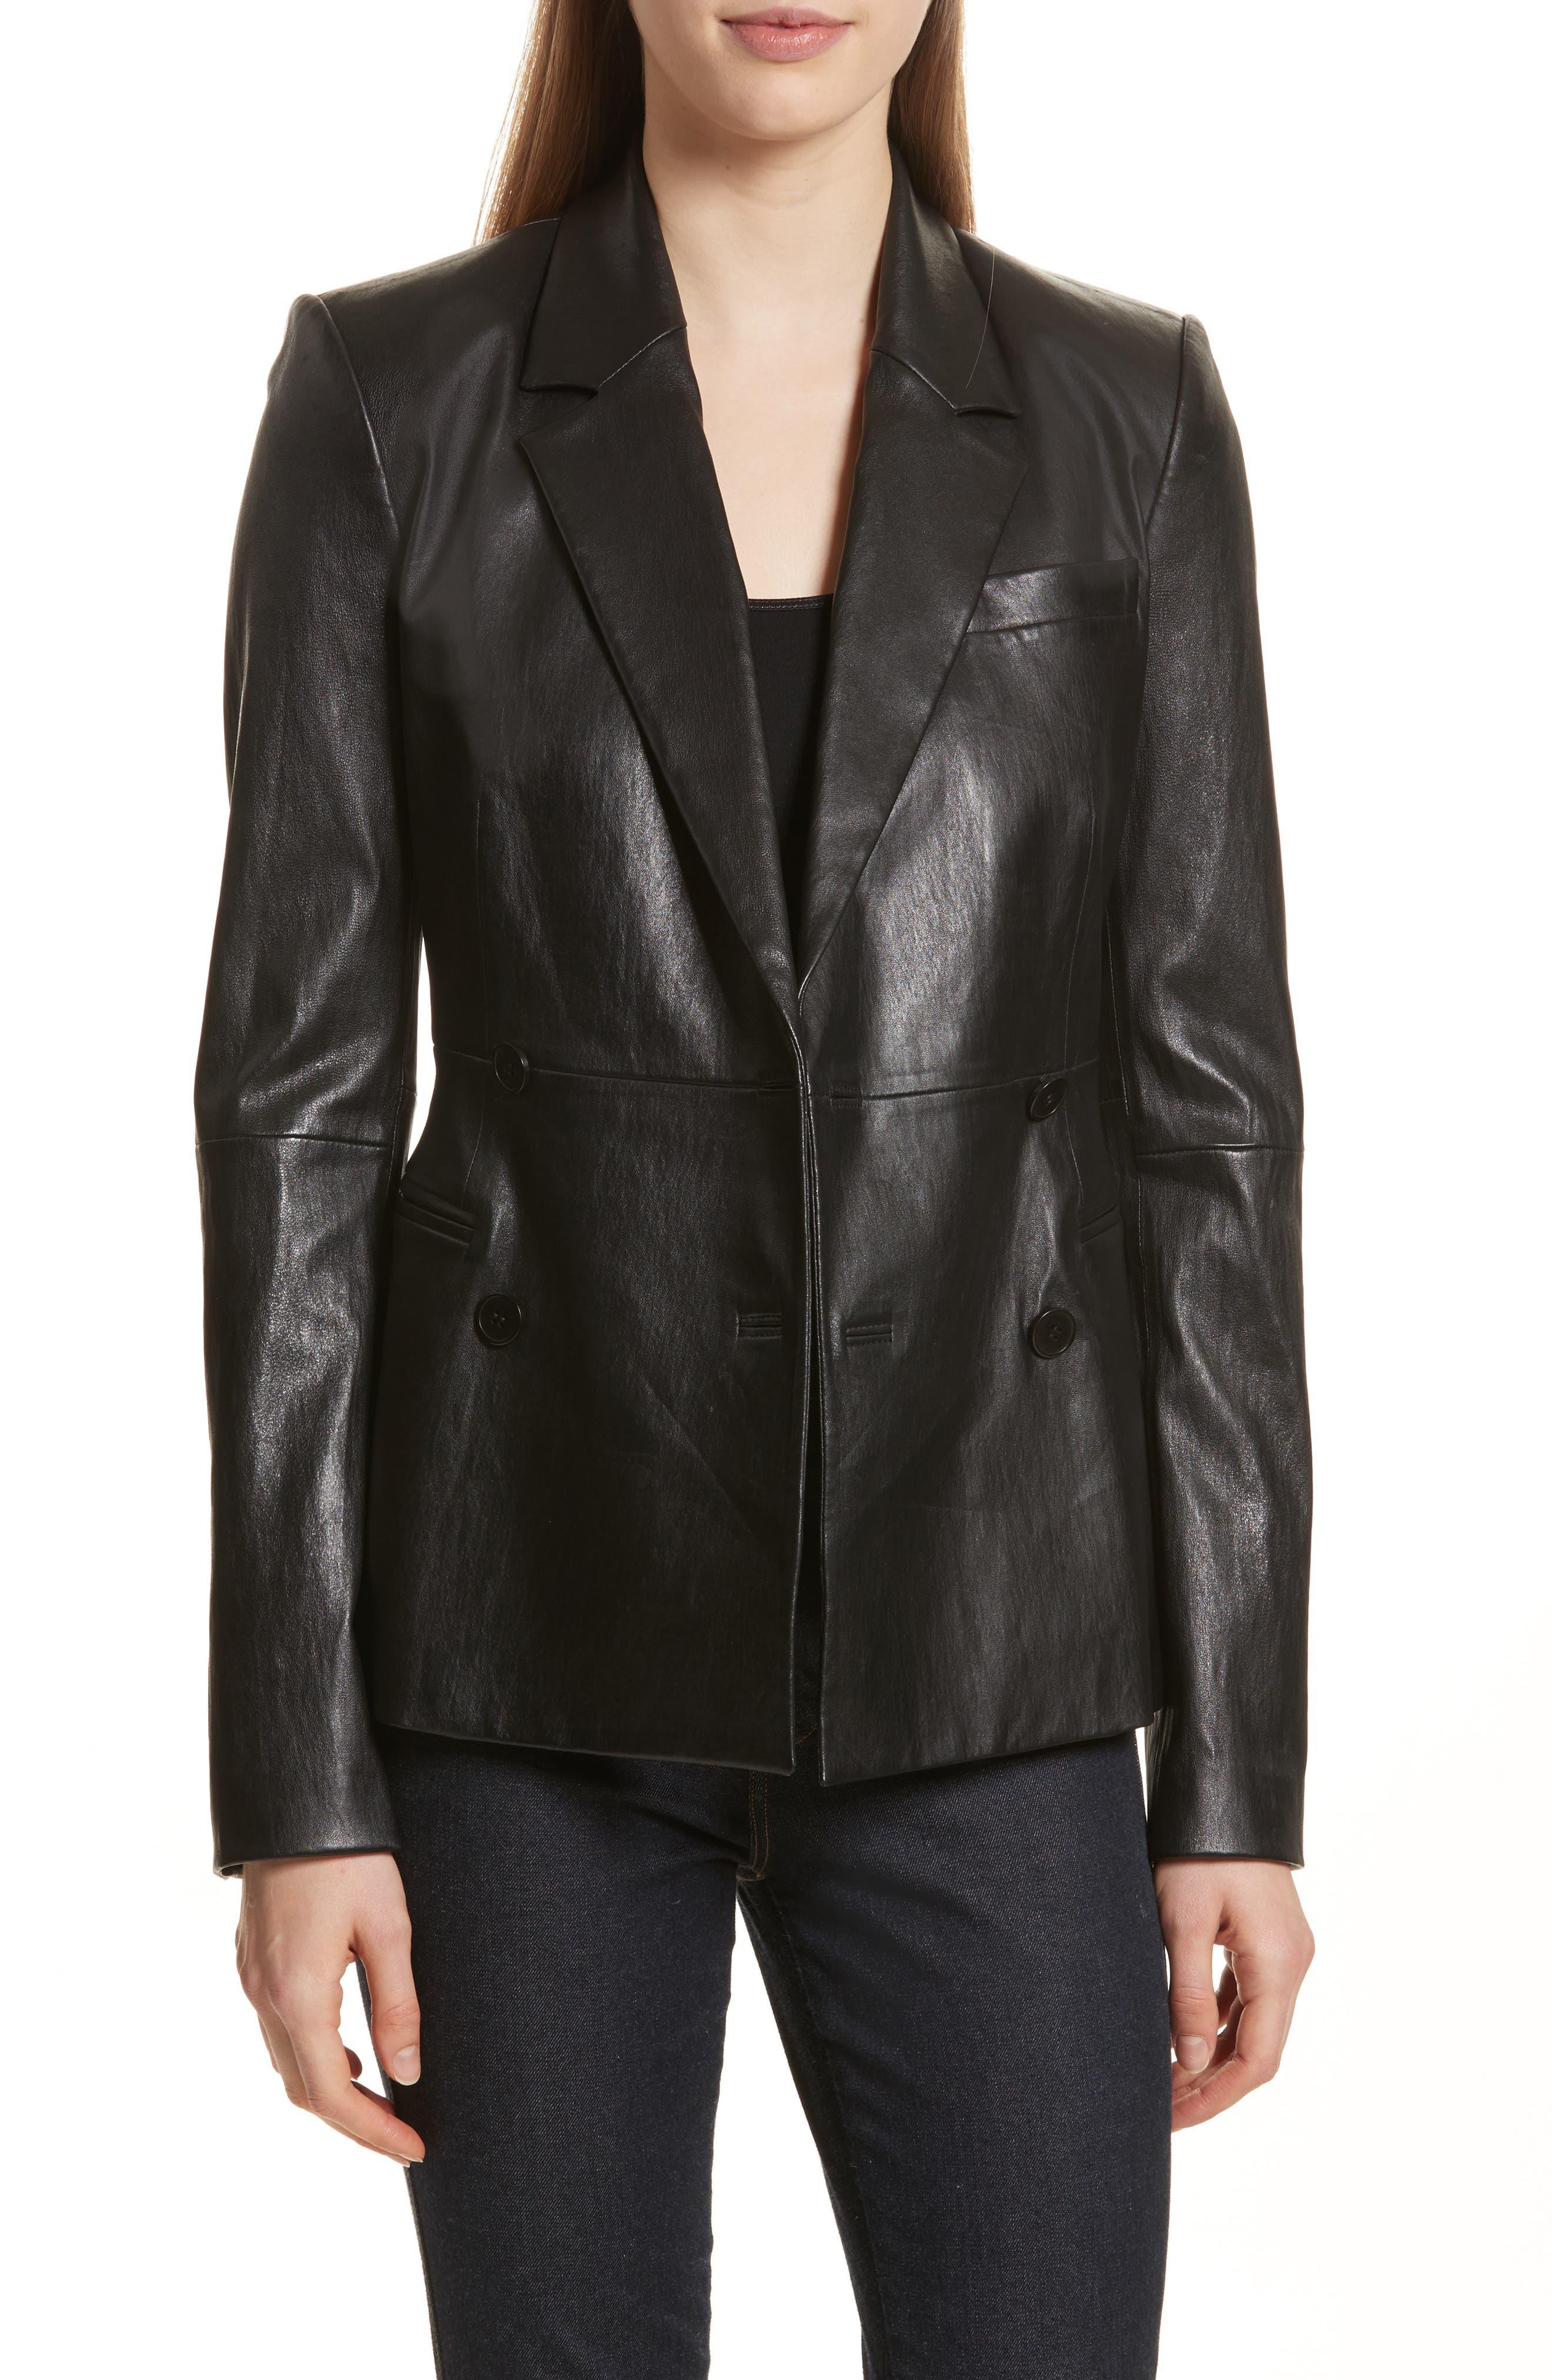 Bristol Leather Blazer,                             Main thumbnail 1, color,                             001